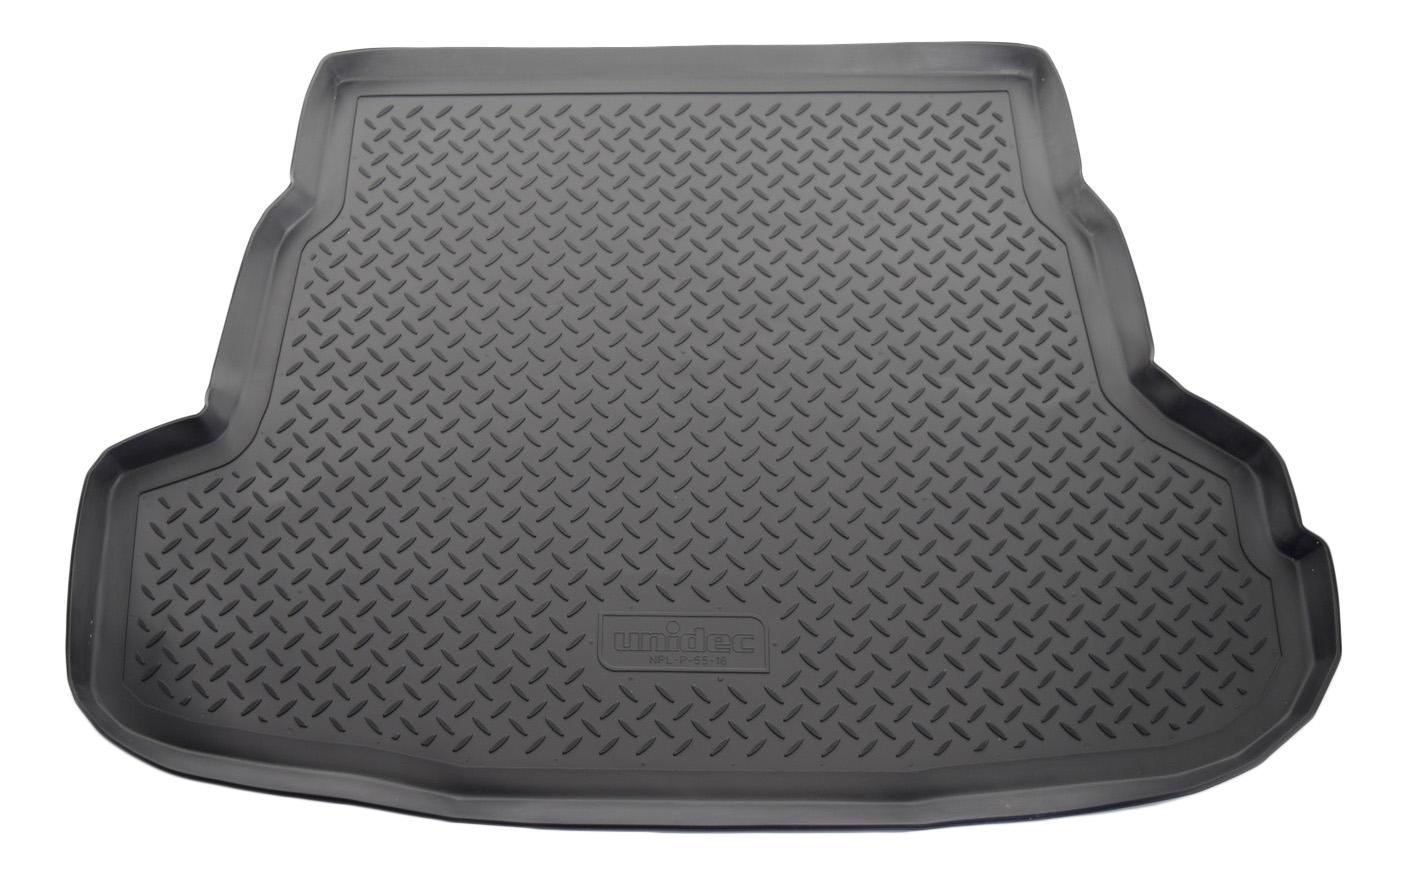 Коврик в багажник автомобиля для Mazda Norplast (NPL-P-55-16) фото